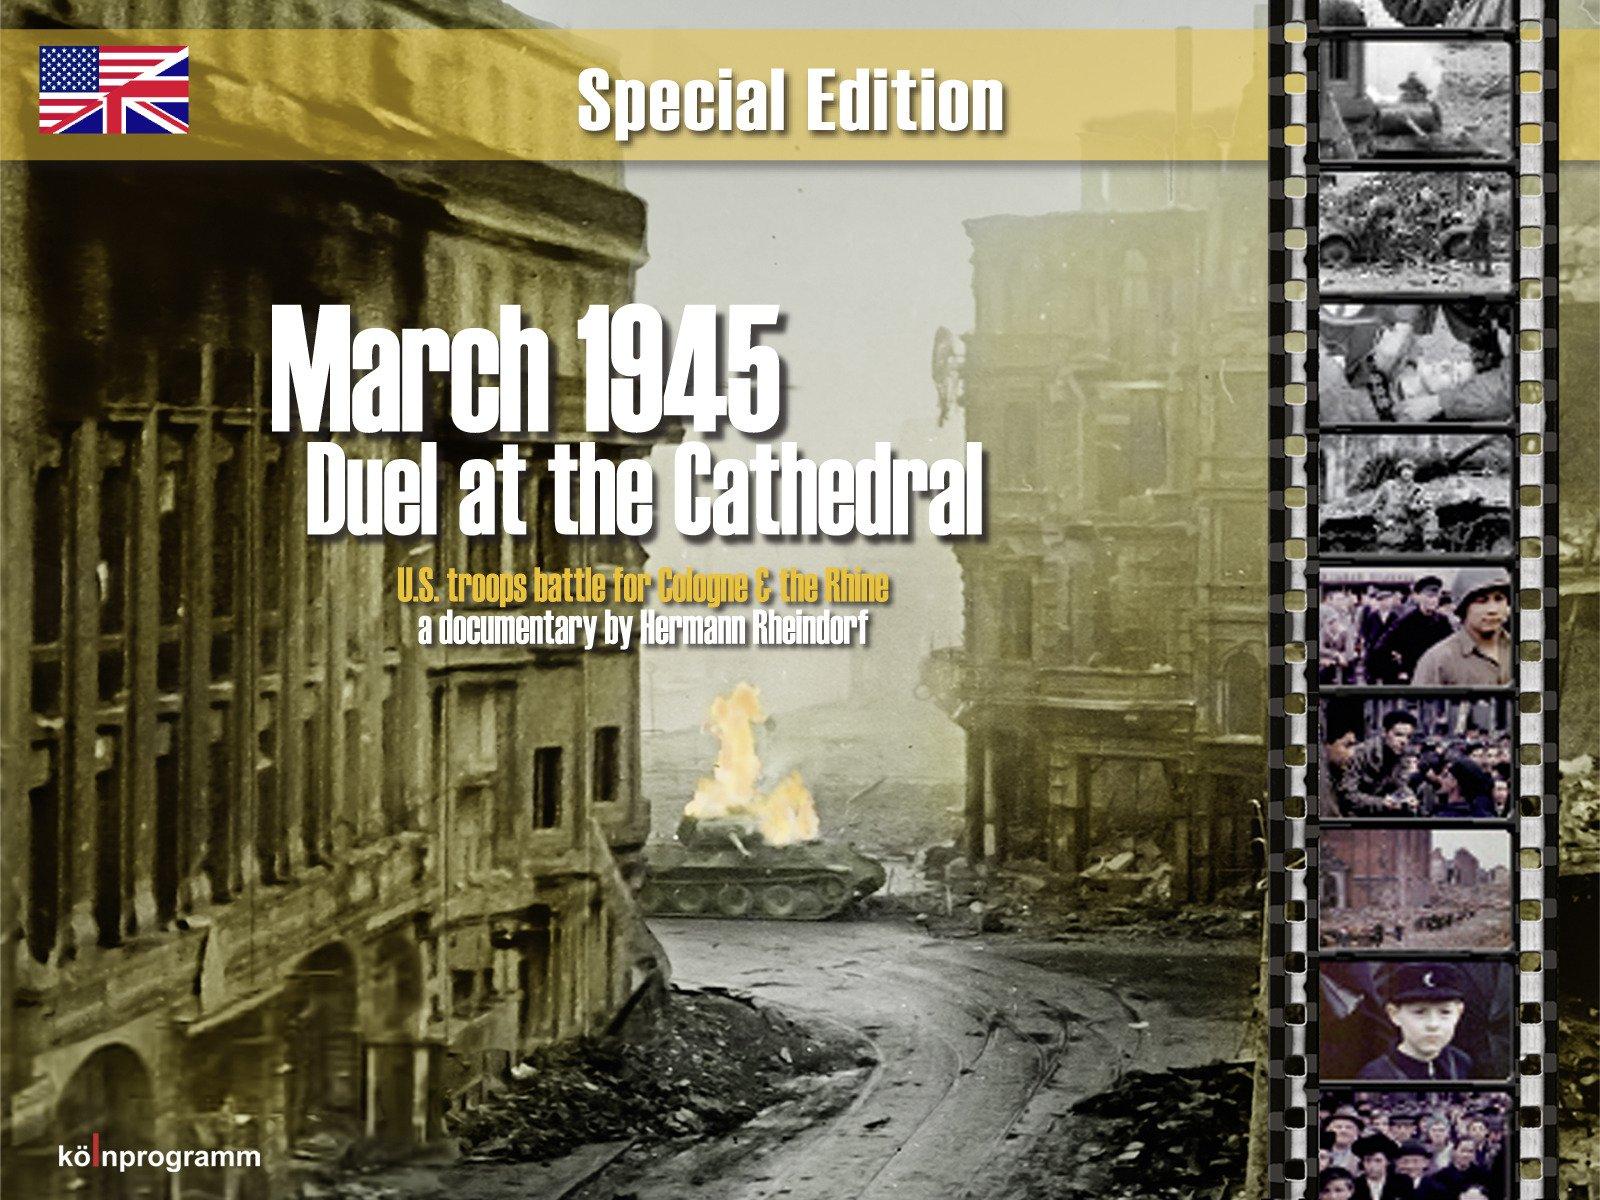 March 1945 - Season 1